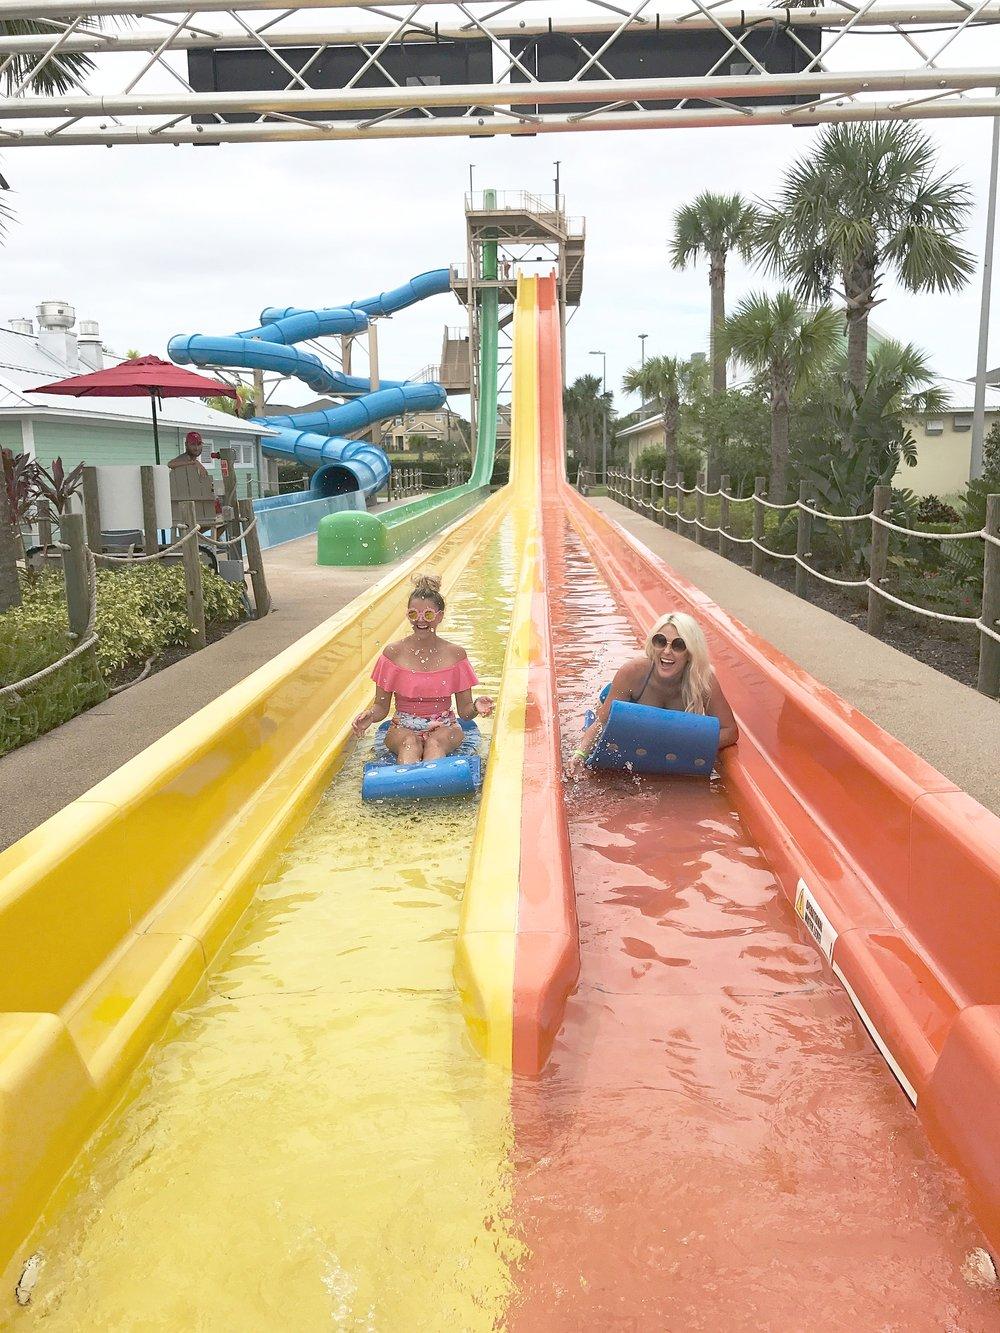 Orlando Resort Waterslide hotel Amenity